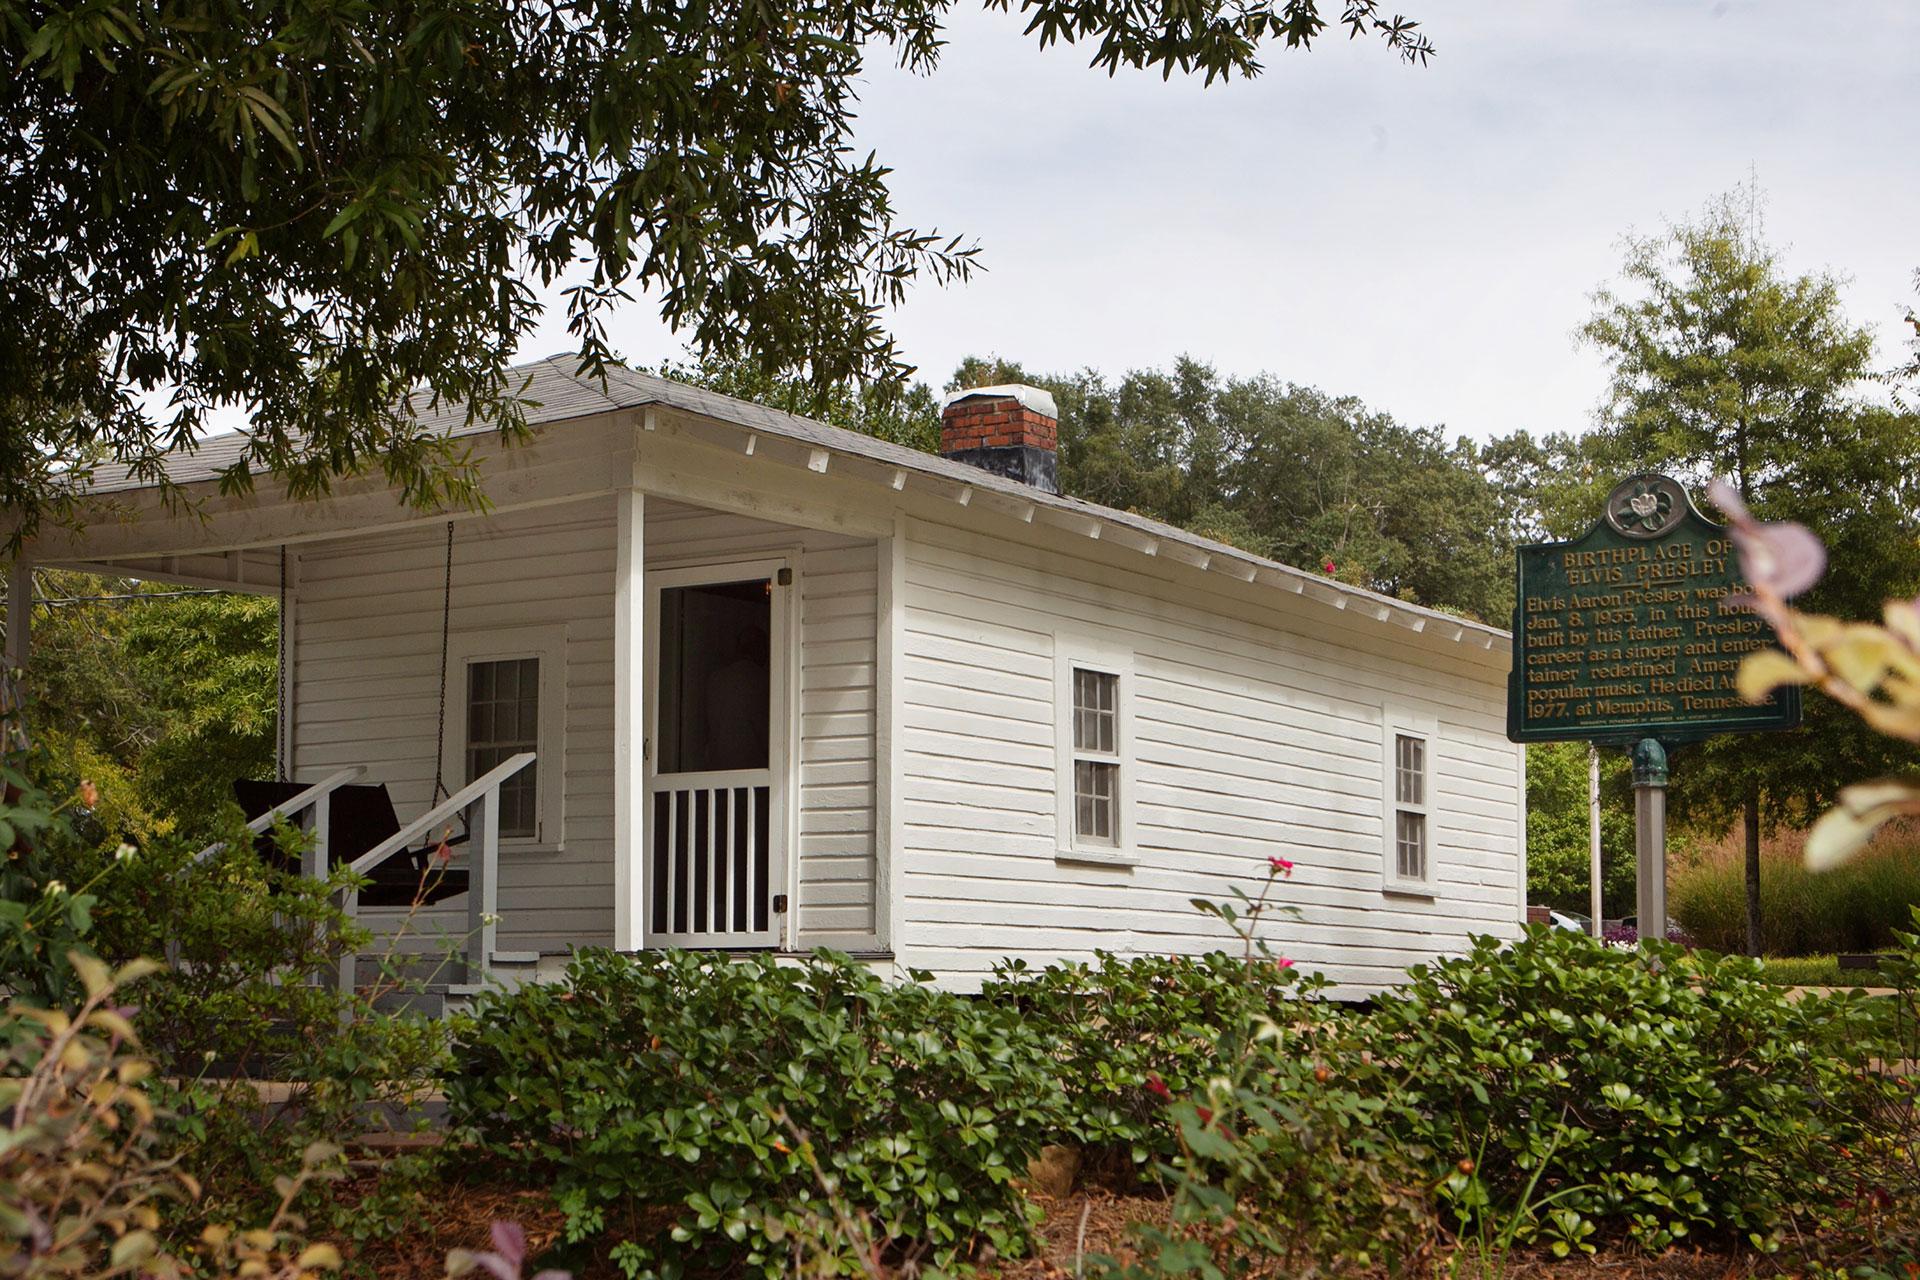 Elvis Presley Birthplace; Courtesy of Visit Tupelo